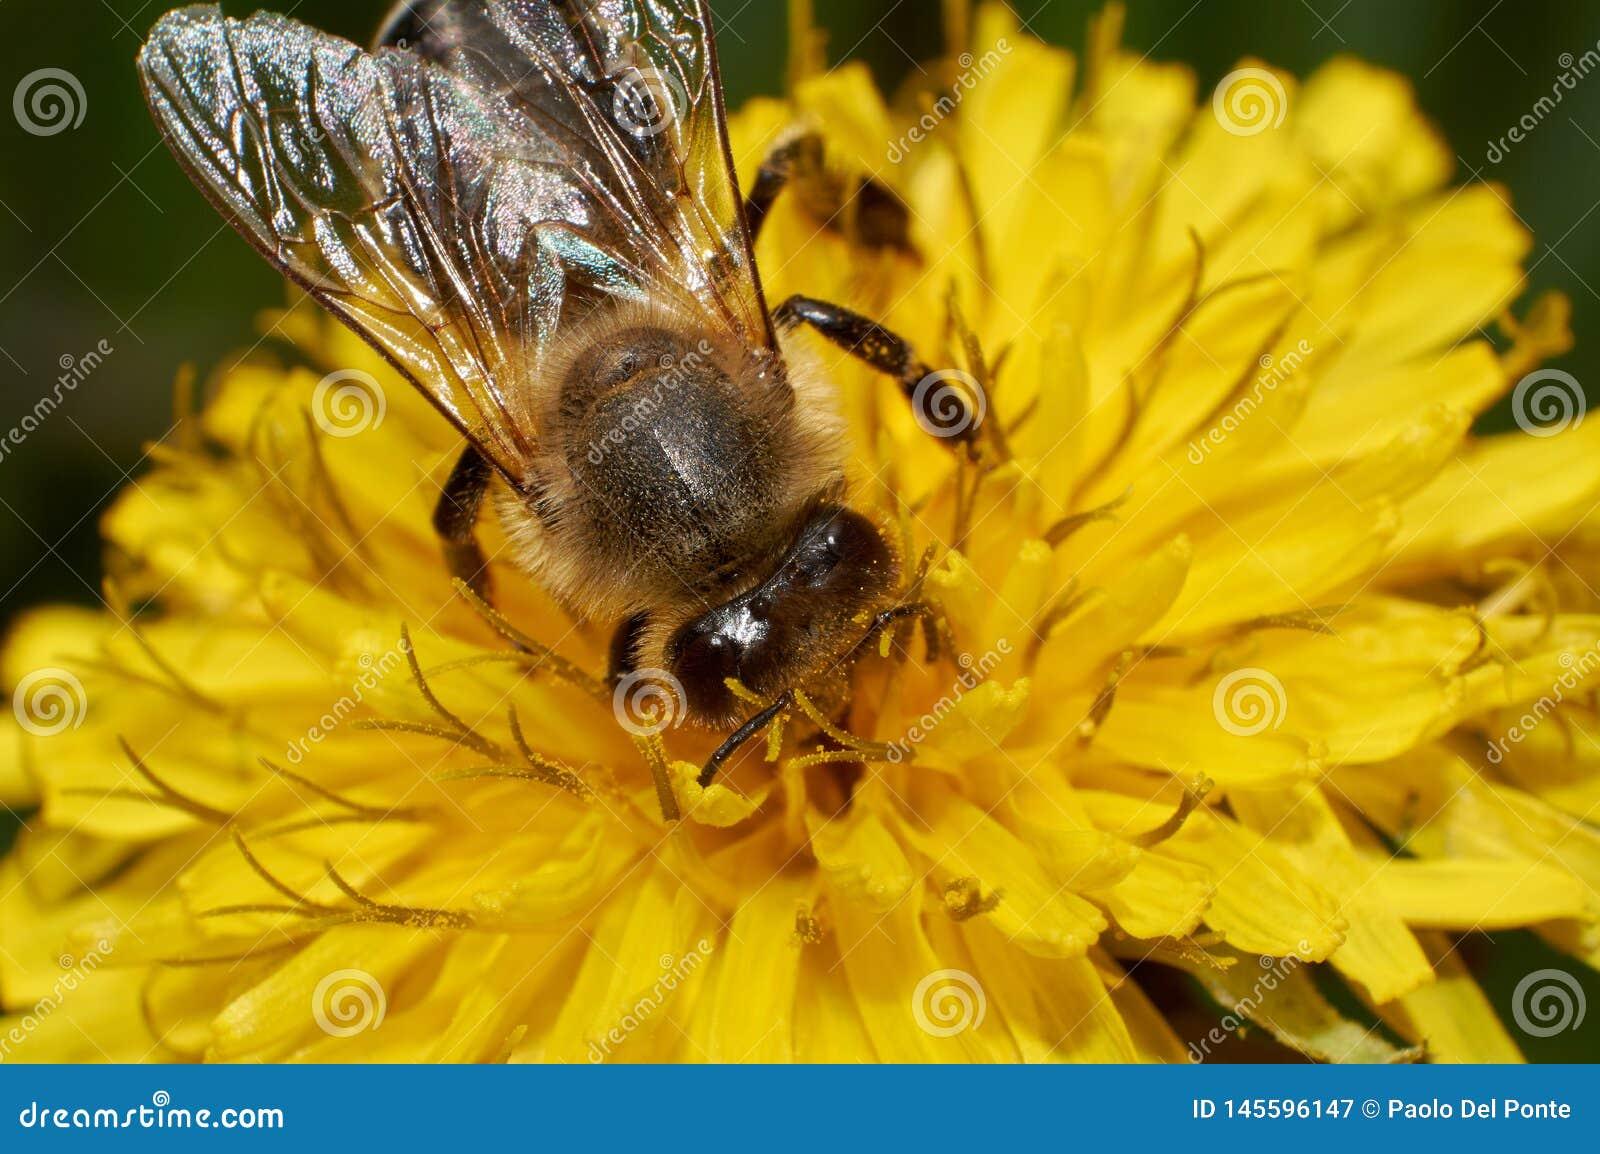 Wild Bee colletcs pollen from dandelion or Taraxacum officinale flower in spring